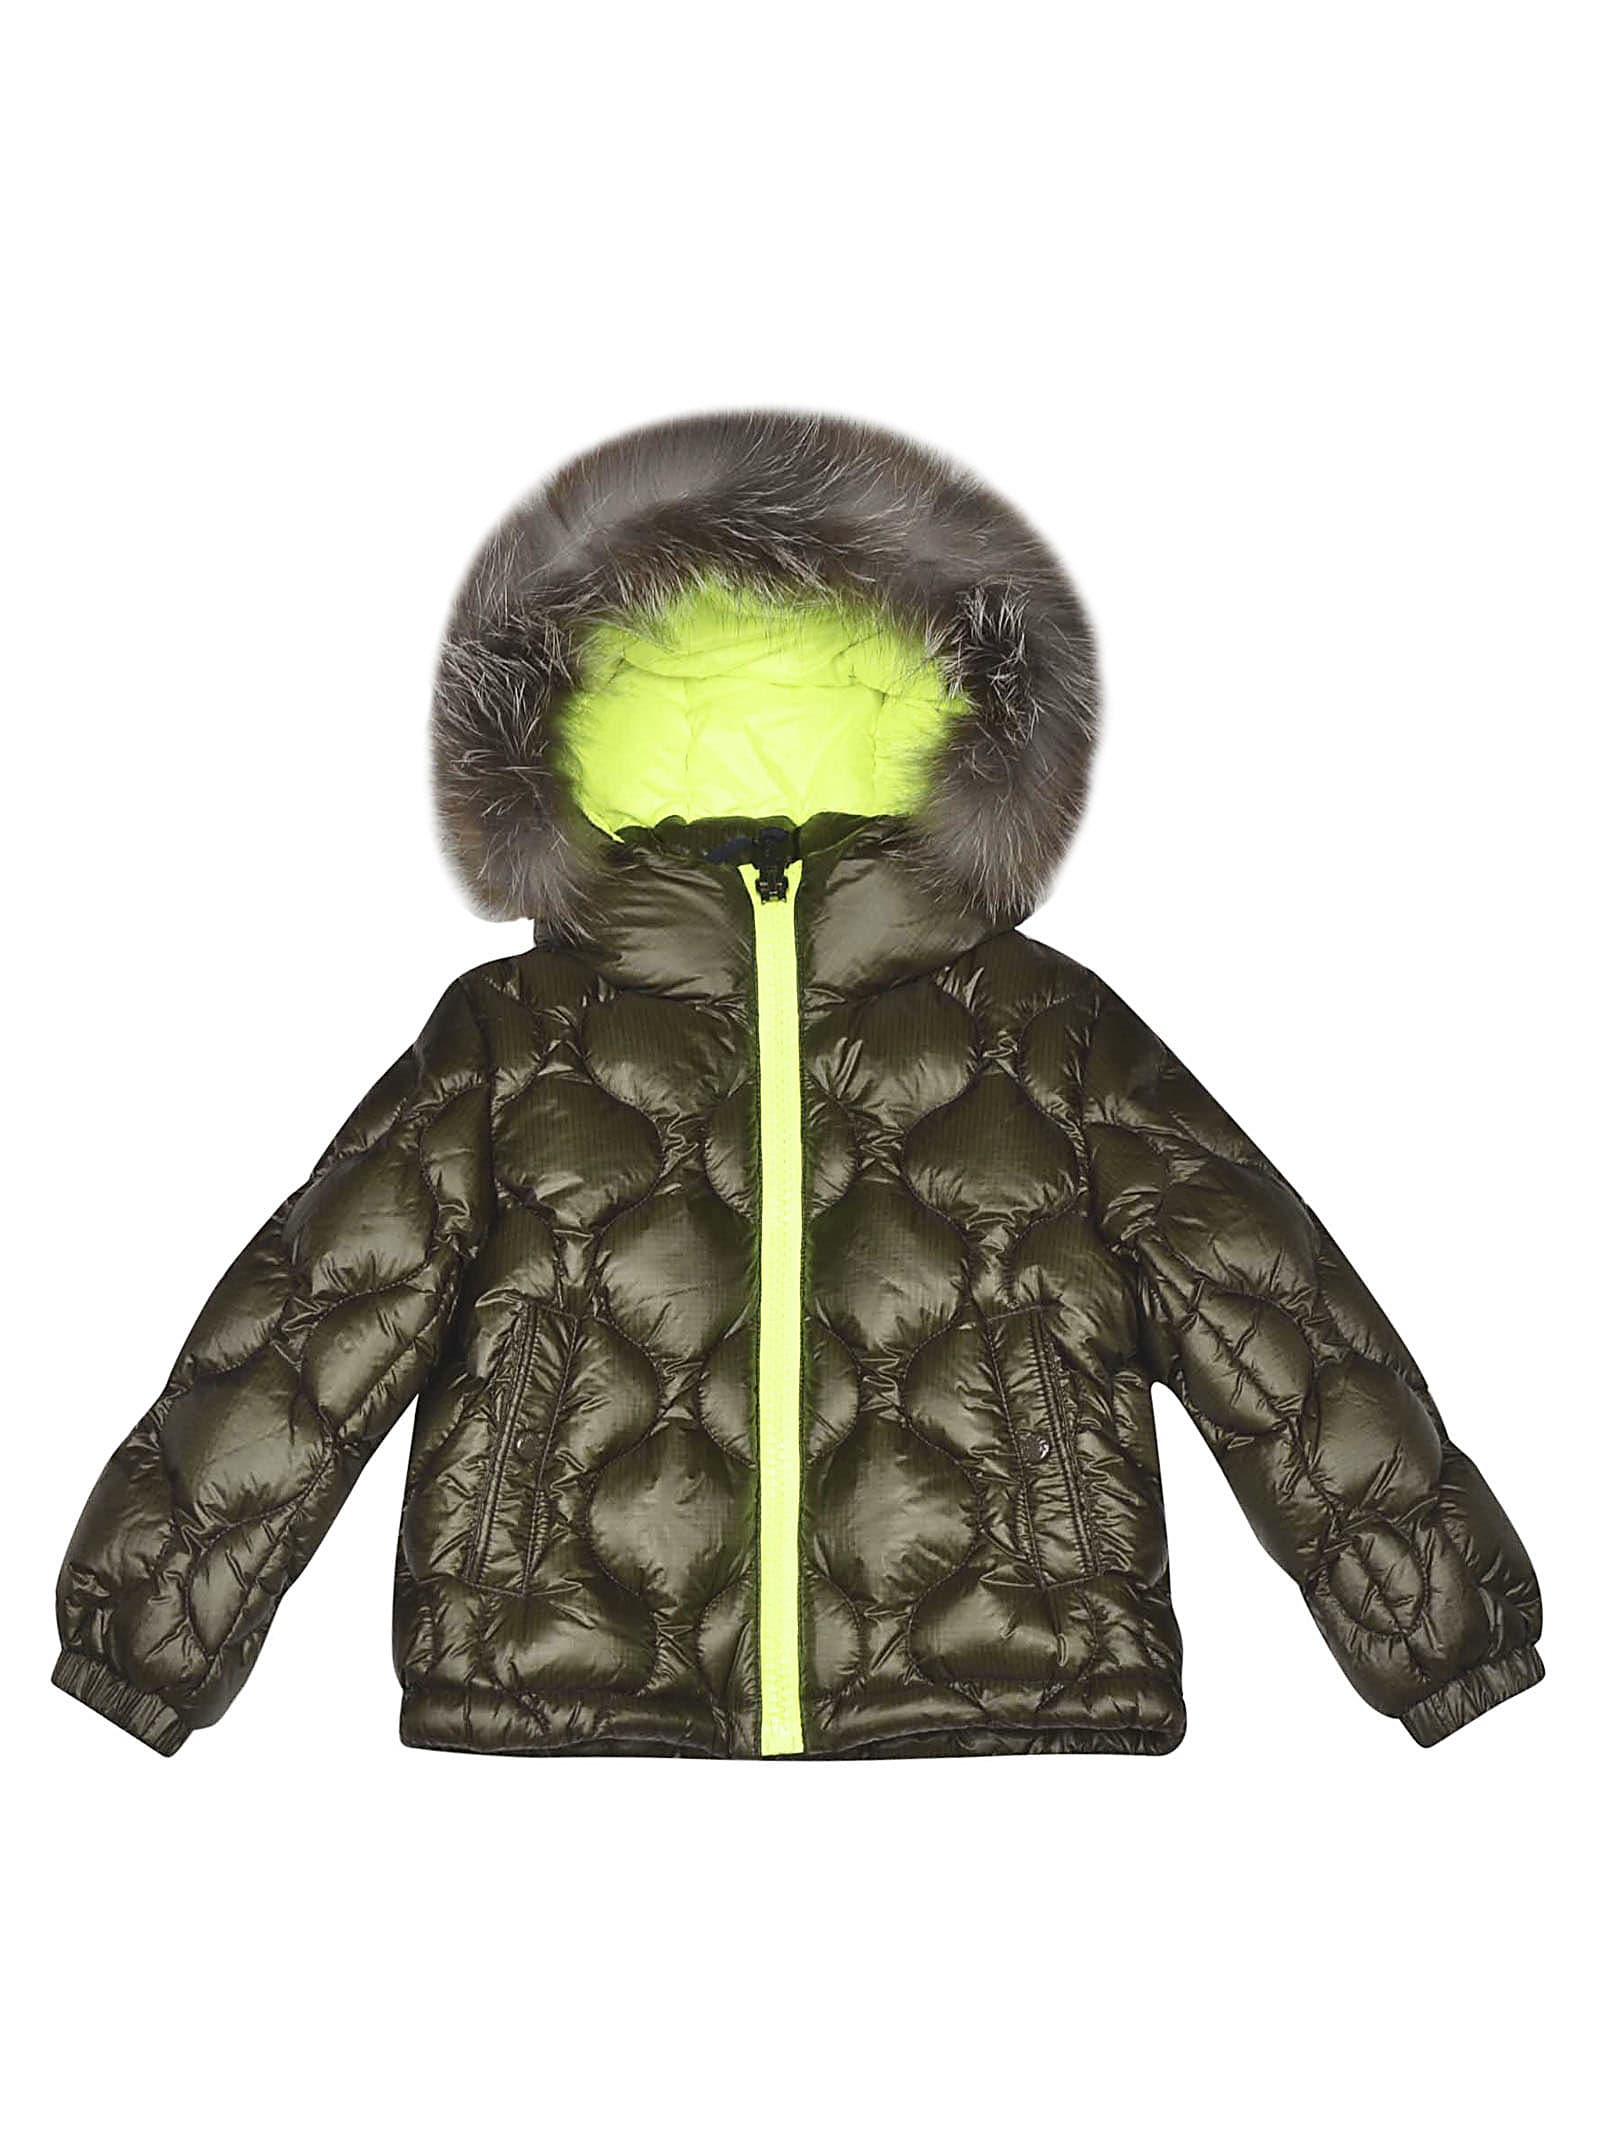 Moncler Kids' Oule Padded Jacket In Verde